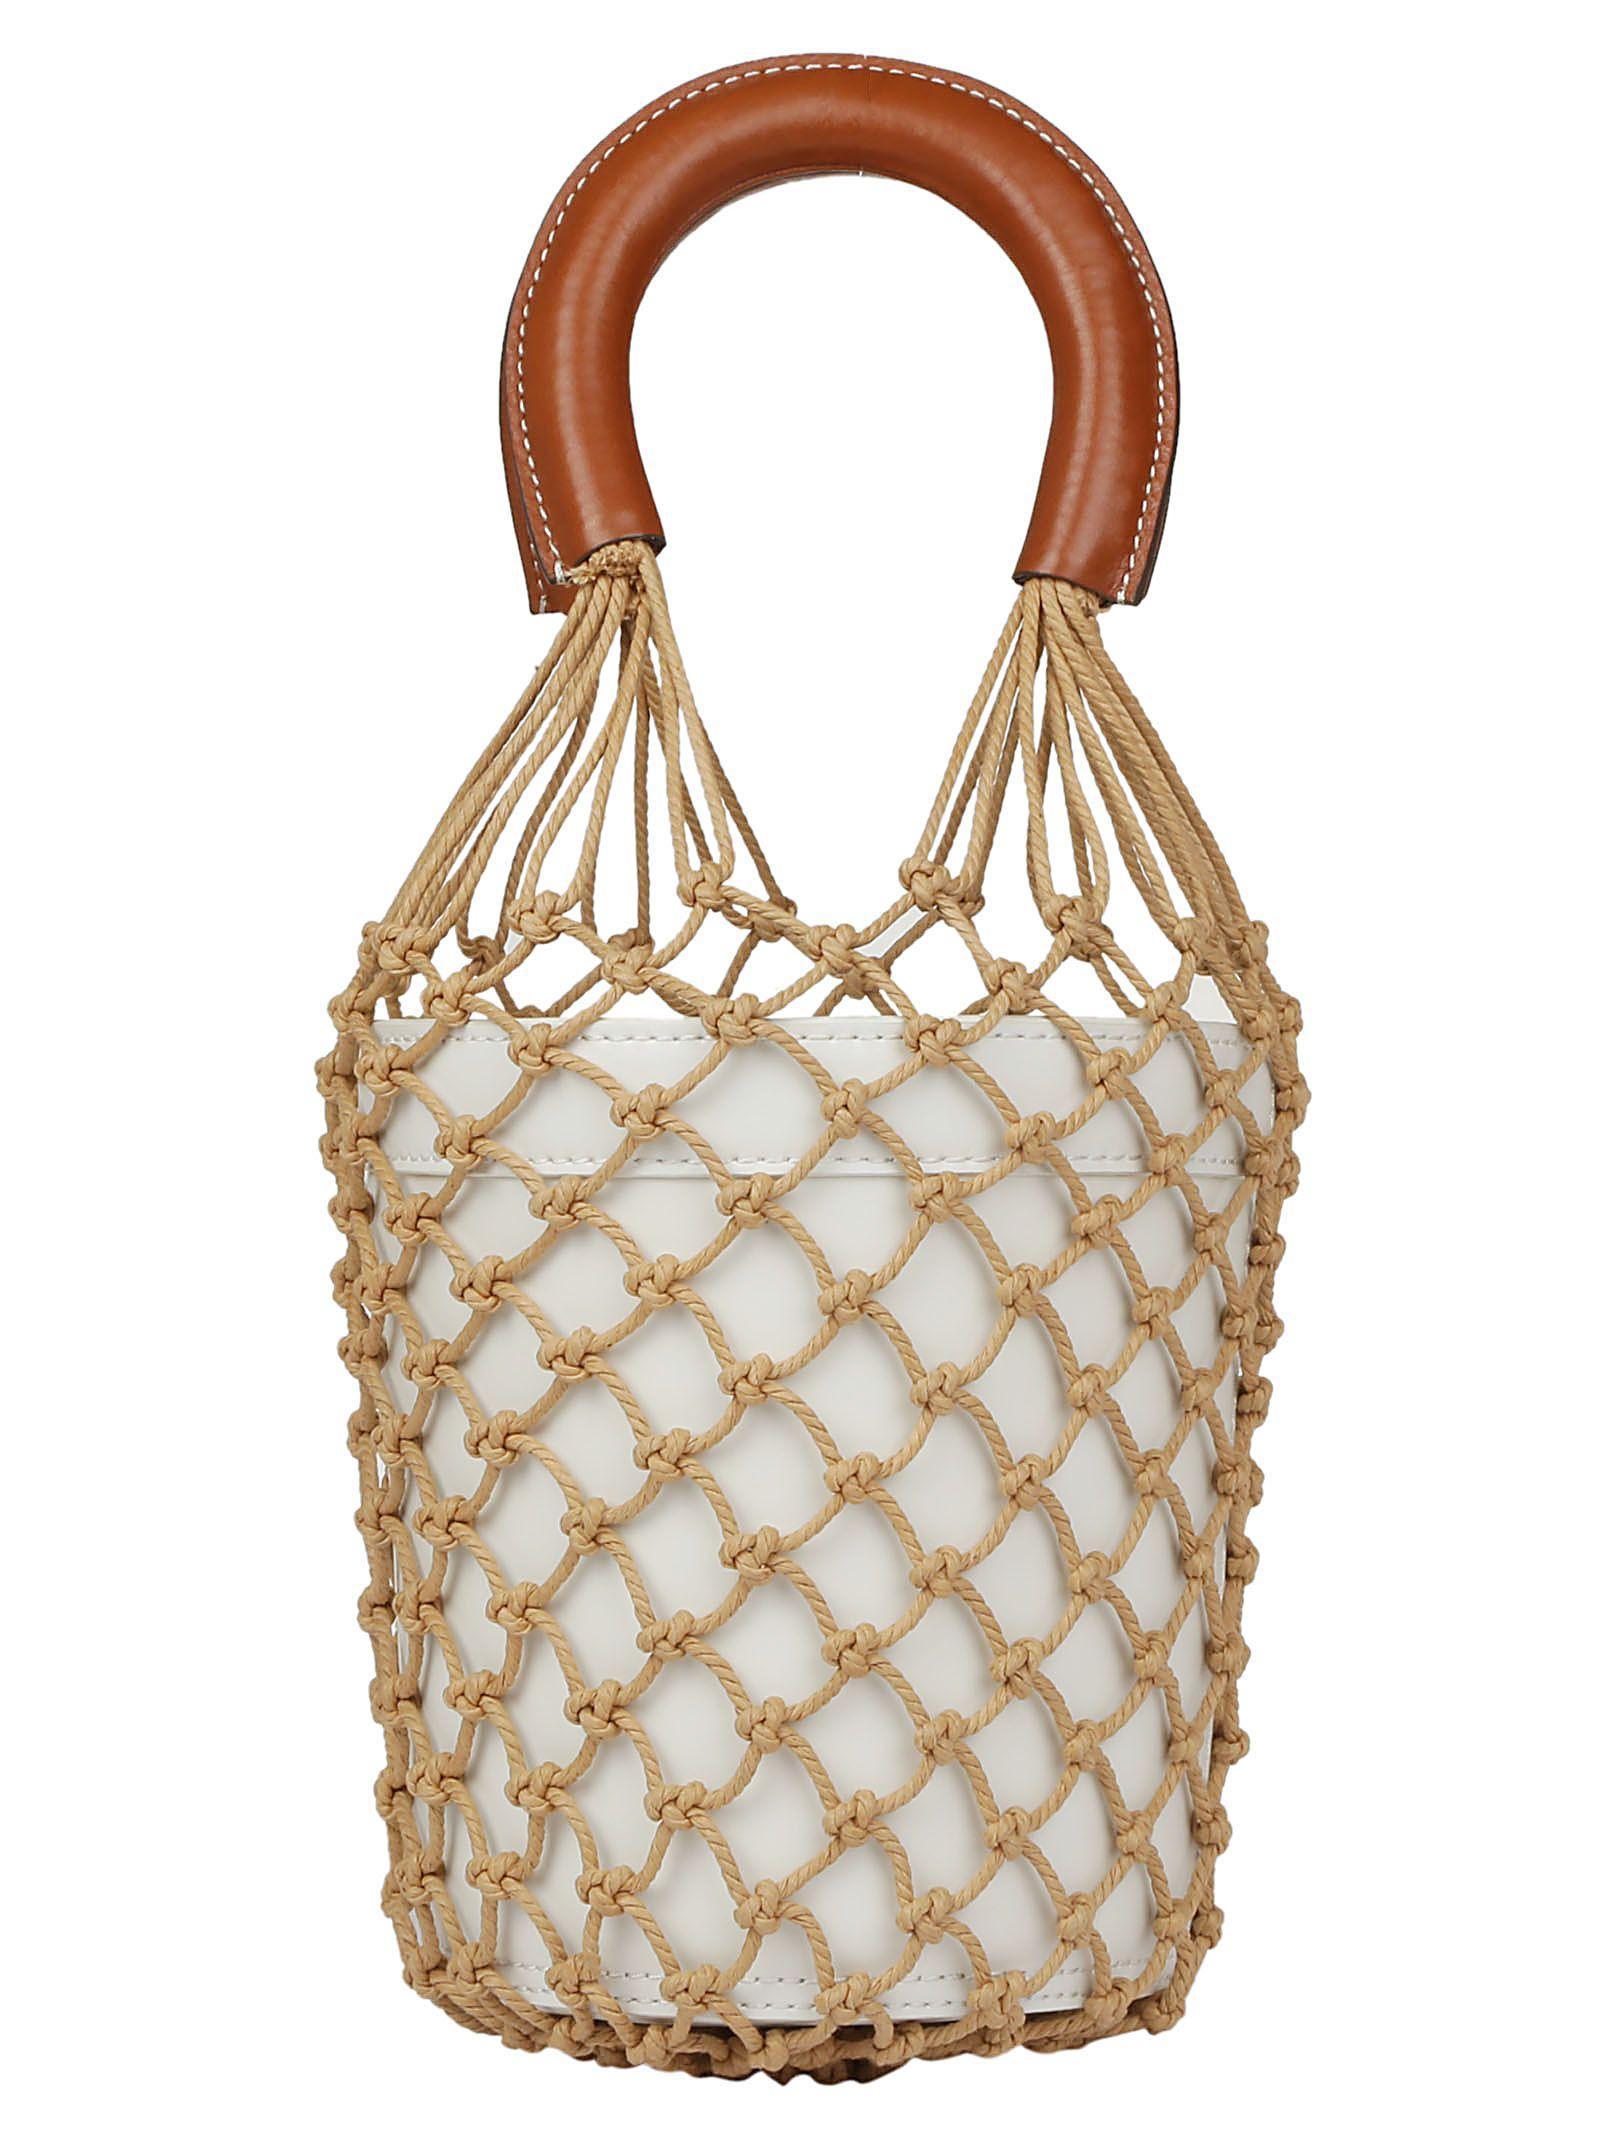 Staud Moreau Handbag In White/brown